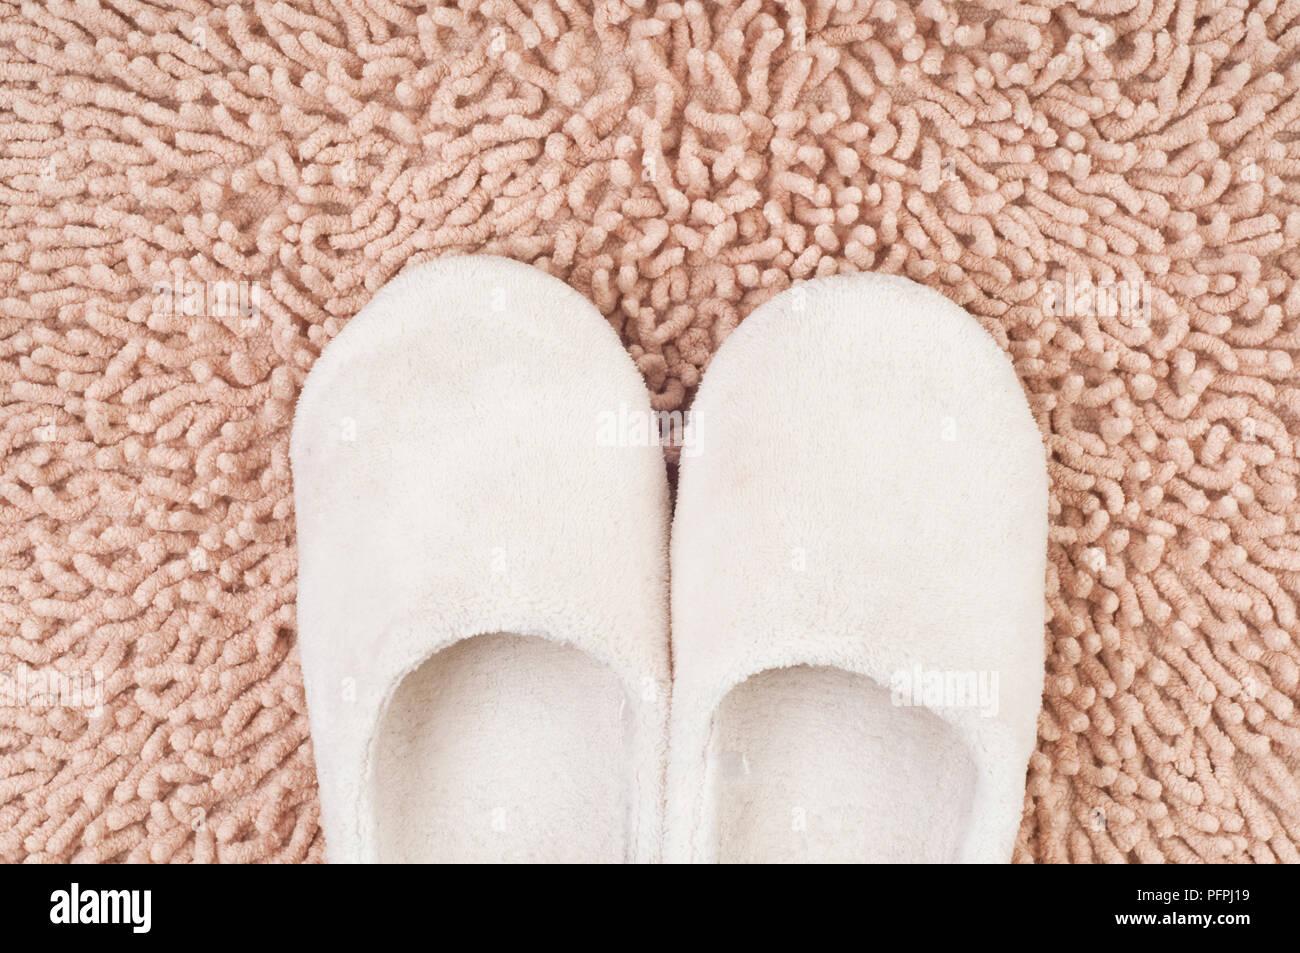 Pair of soft white children's slippers on beige shag pile carpet, overhead view - Stock Image